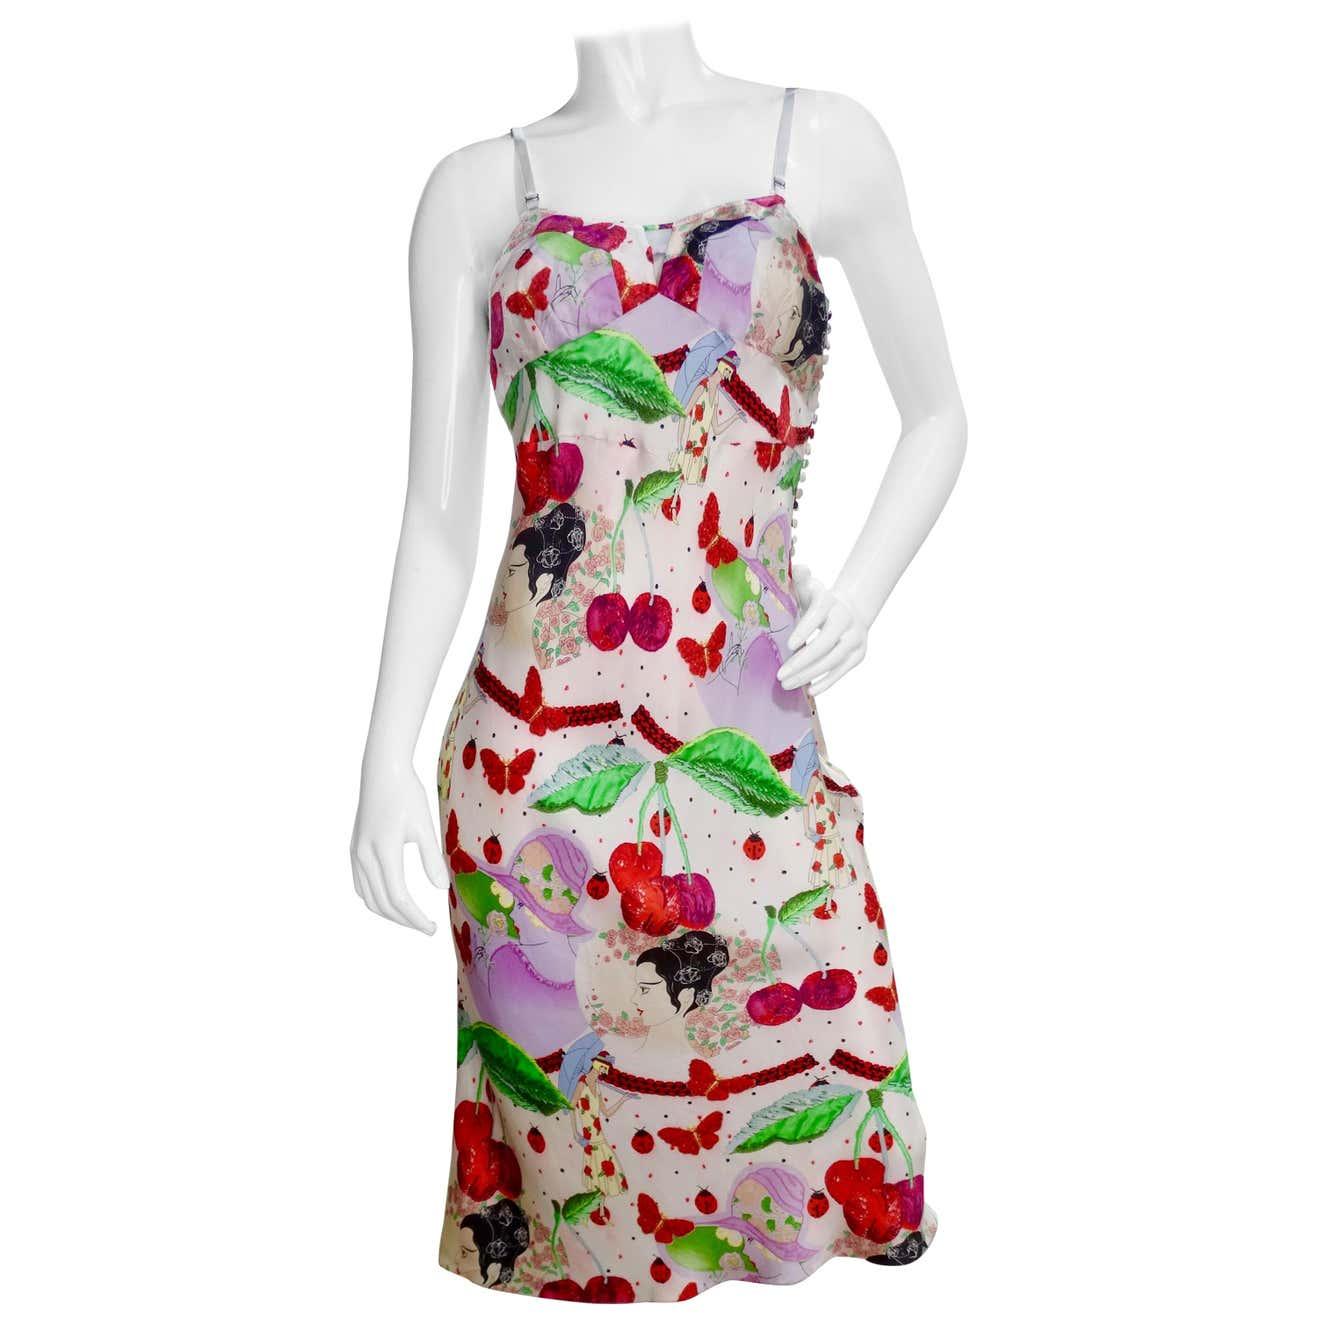 2000s Cherry Motif Silk Slip Dress by John Galliano, available on 1stdibs.com for $750 Kim Kardashian Dress Exact Product